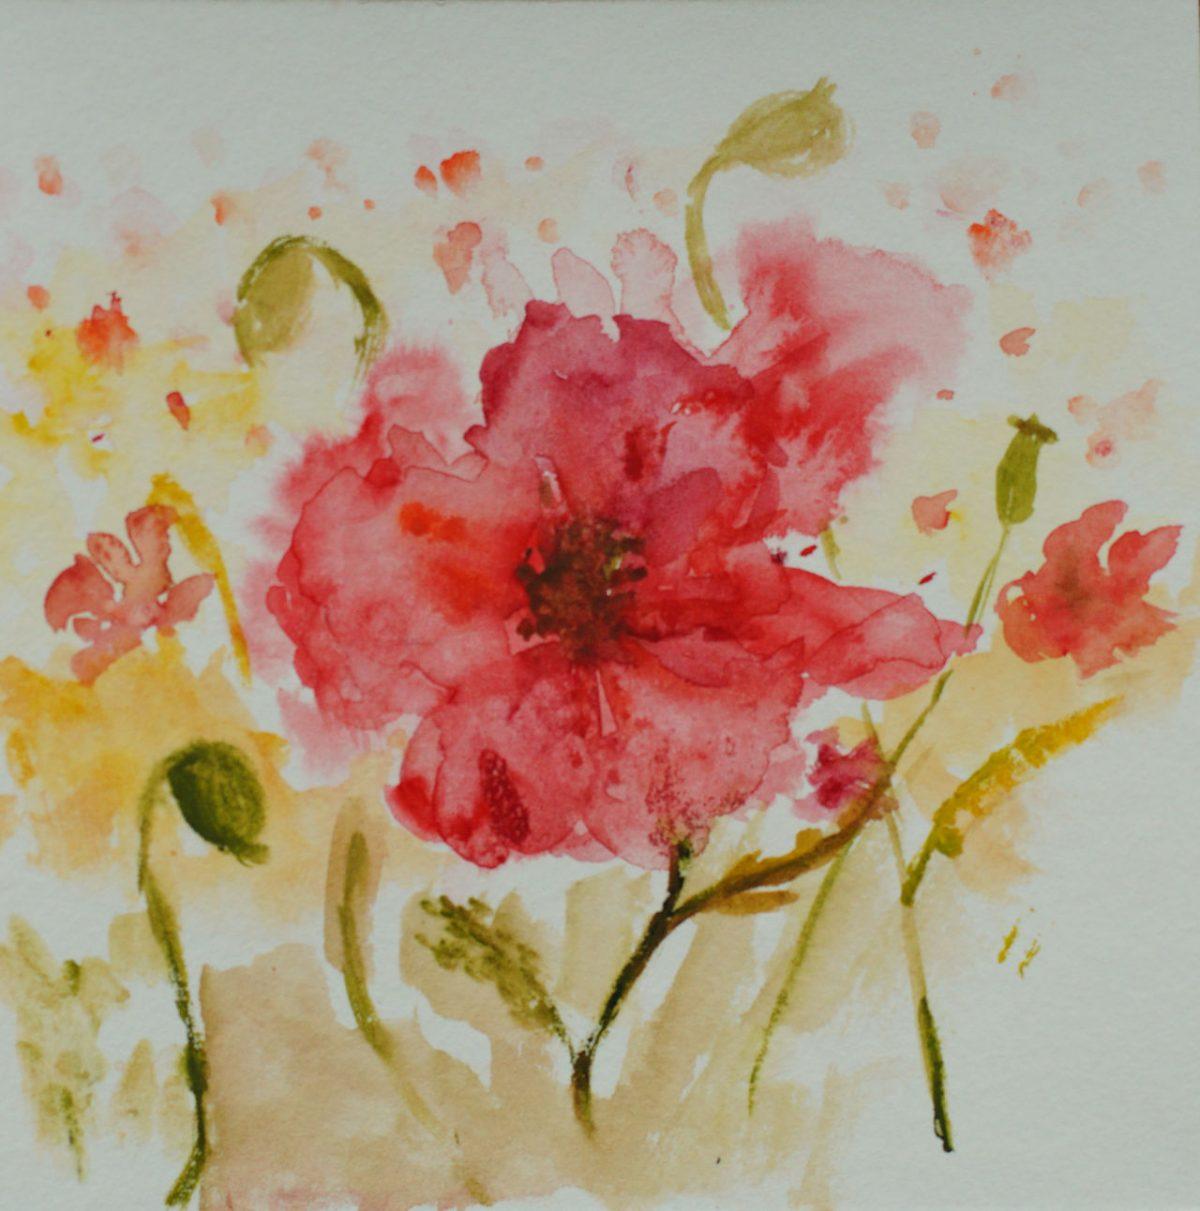 A quick watercolour poppy